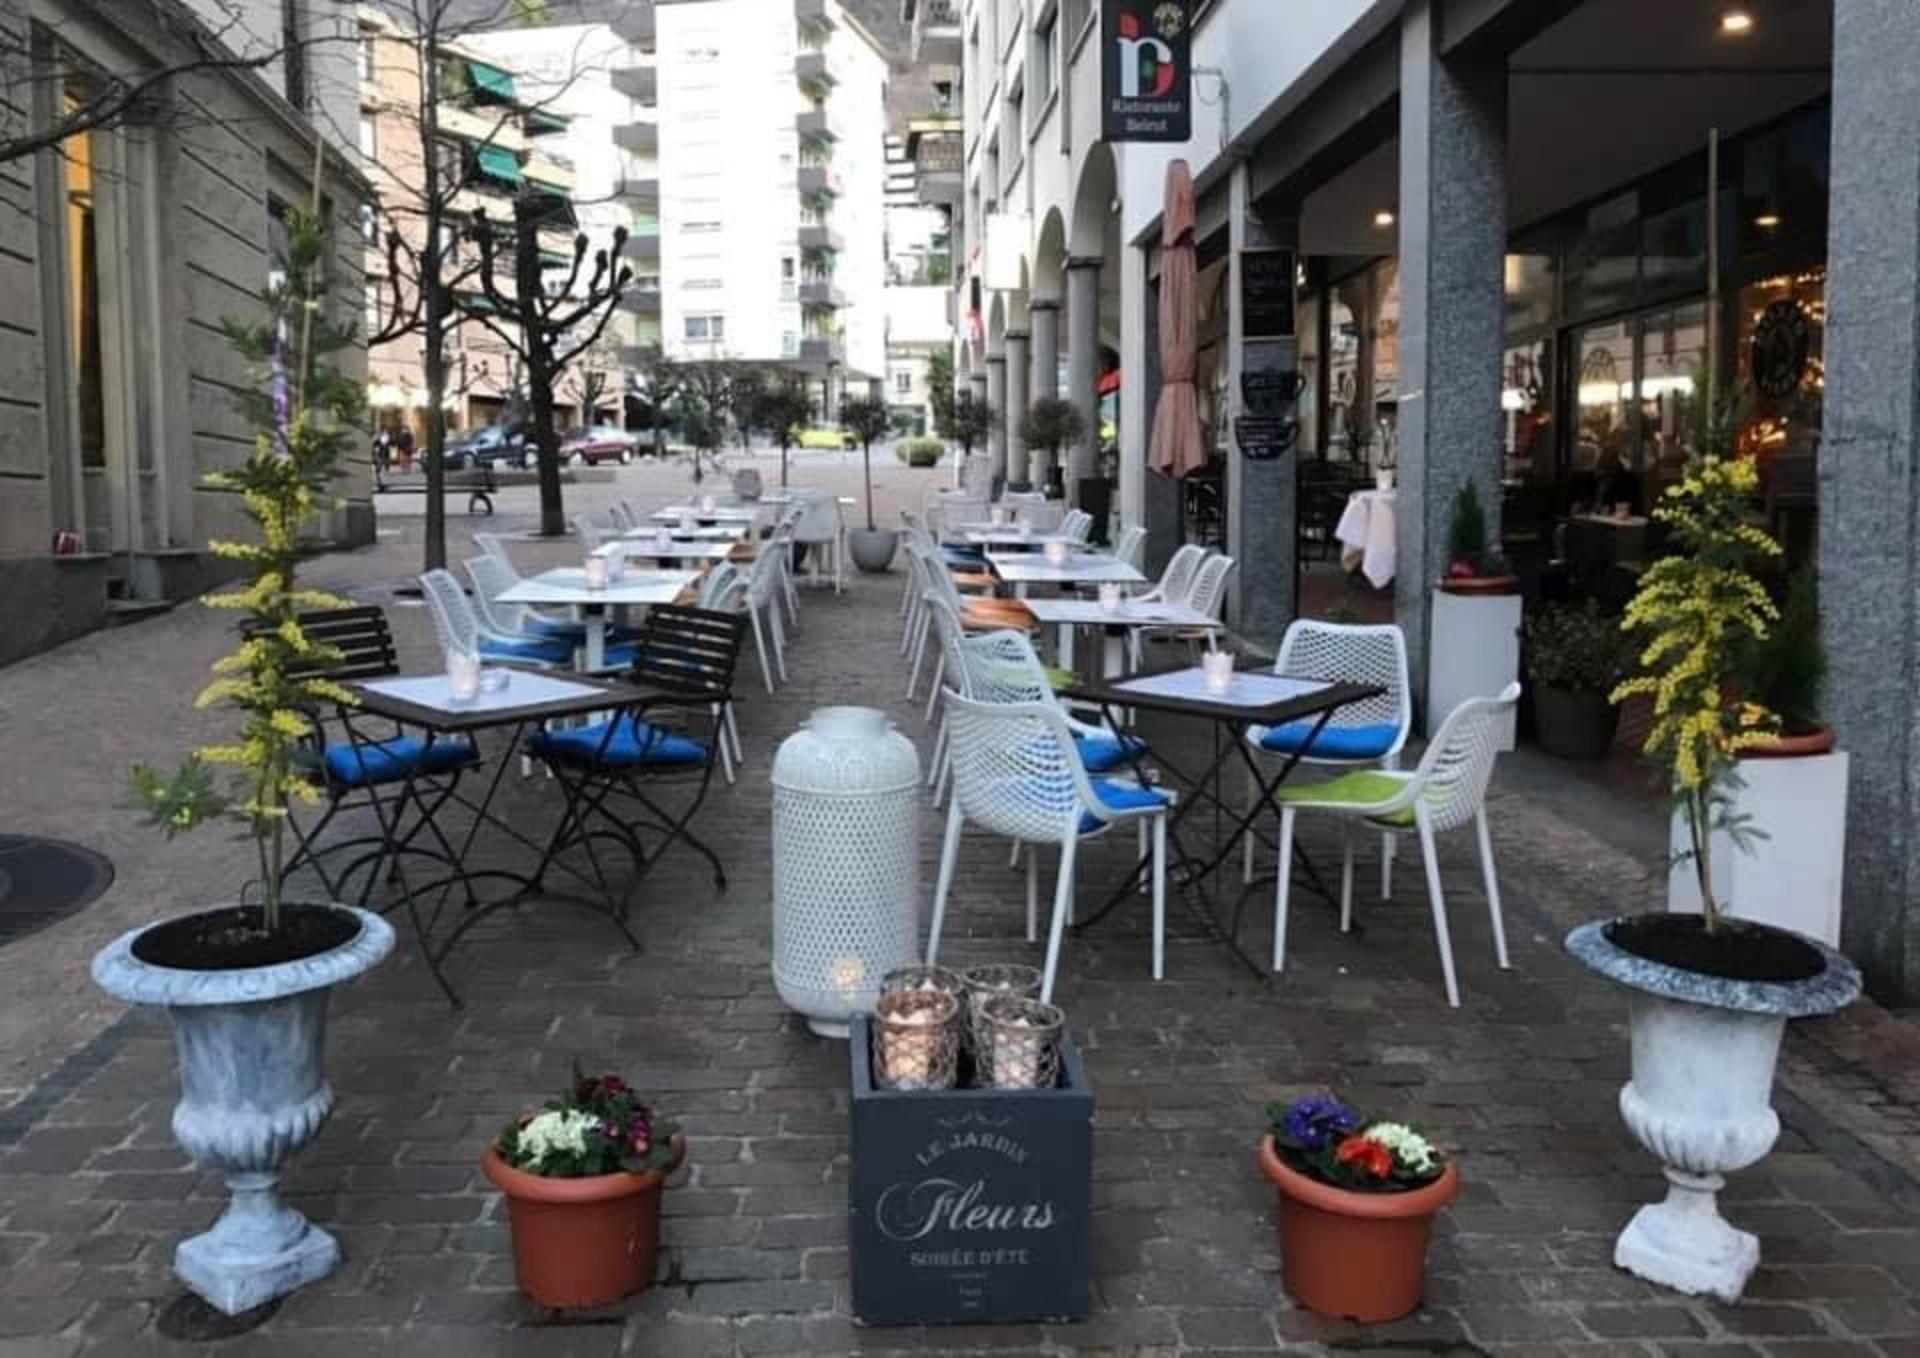 Benvenuti al Ristorante Beirut